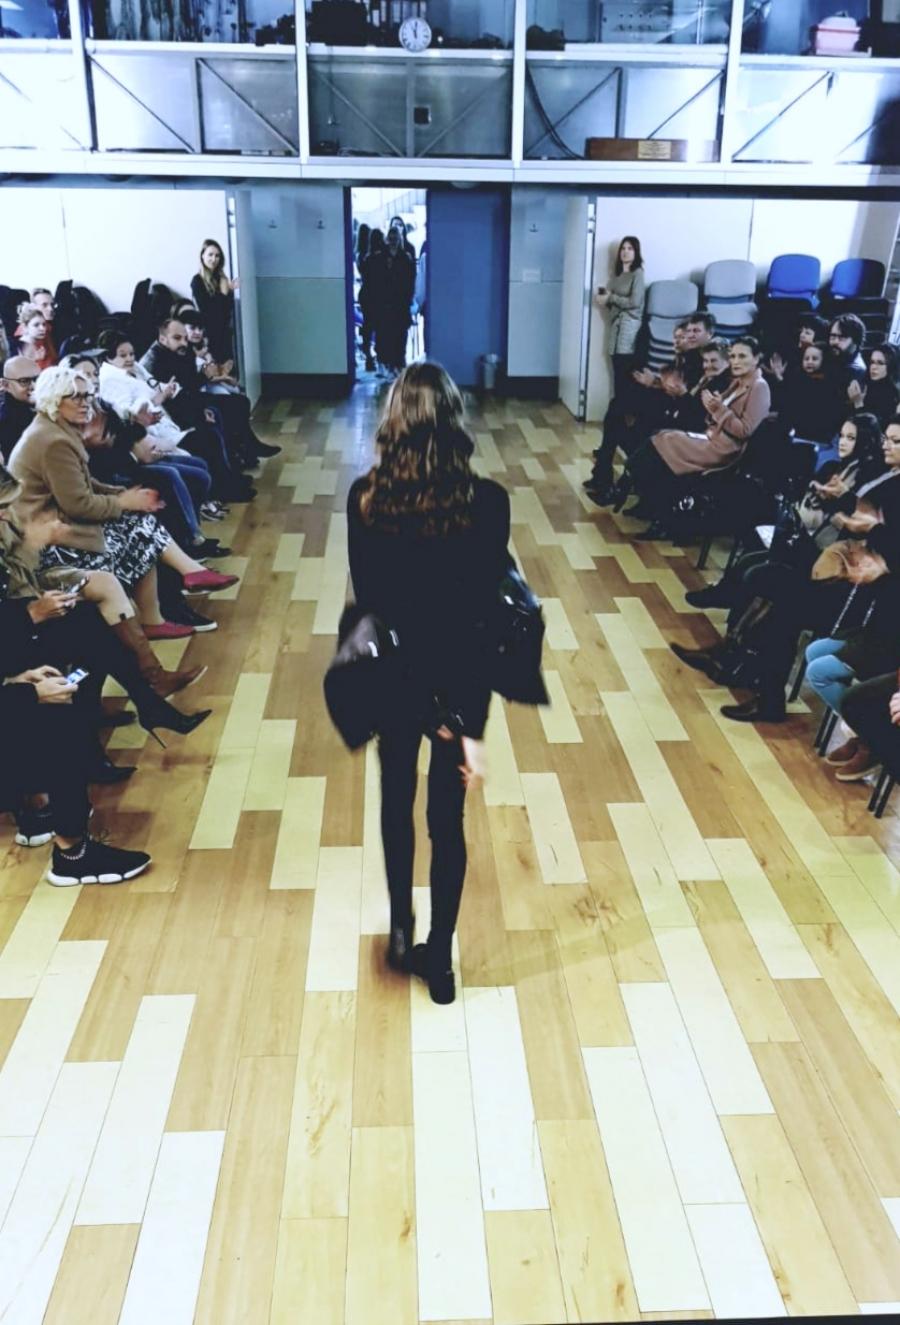 Završna priredba Midikenn modna škola hodanja